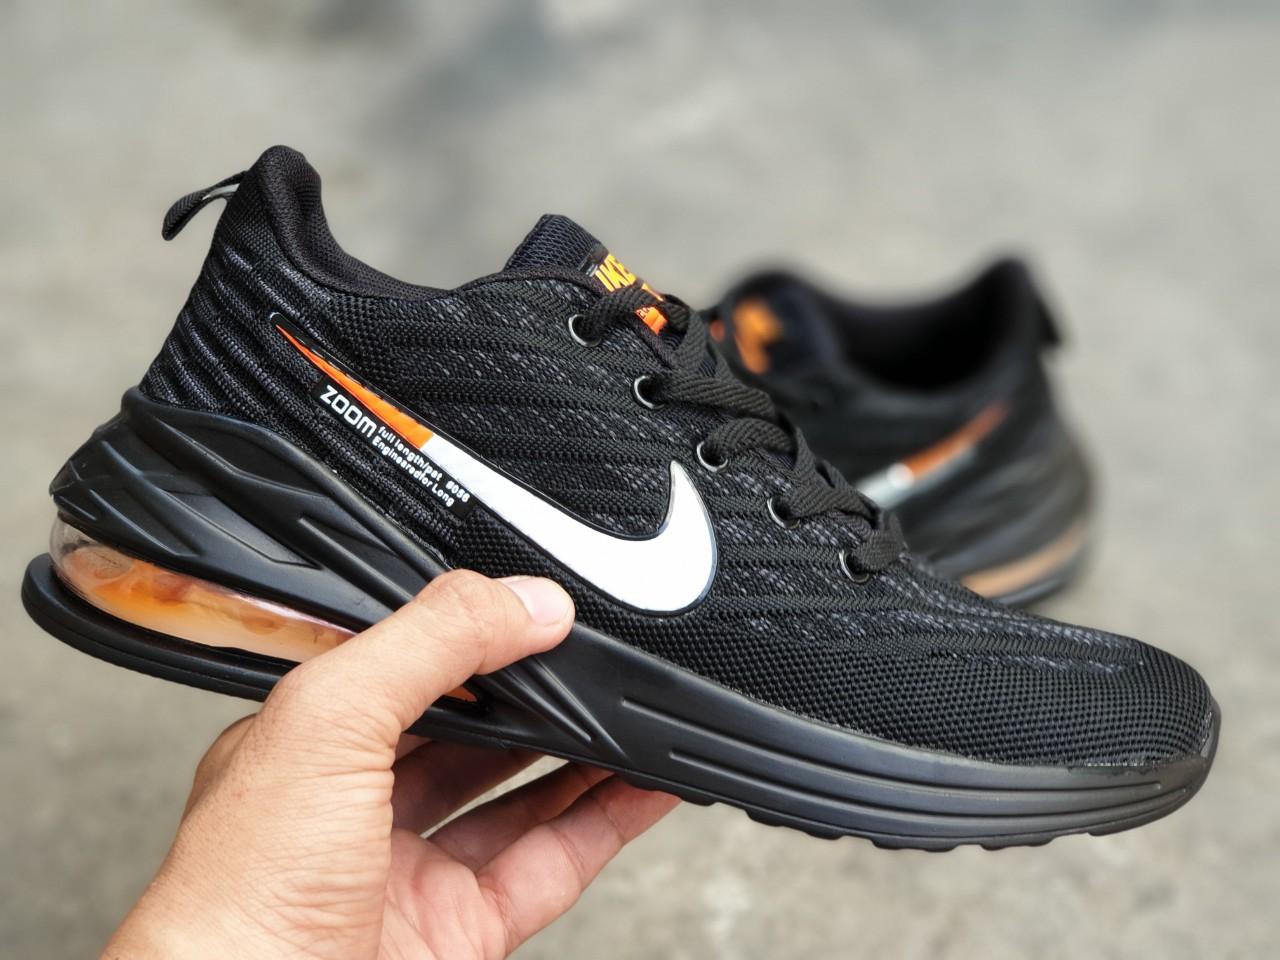 Giày Nike Zoom nam X3 cam